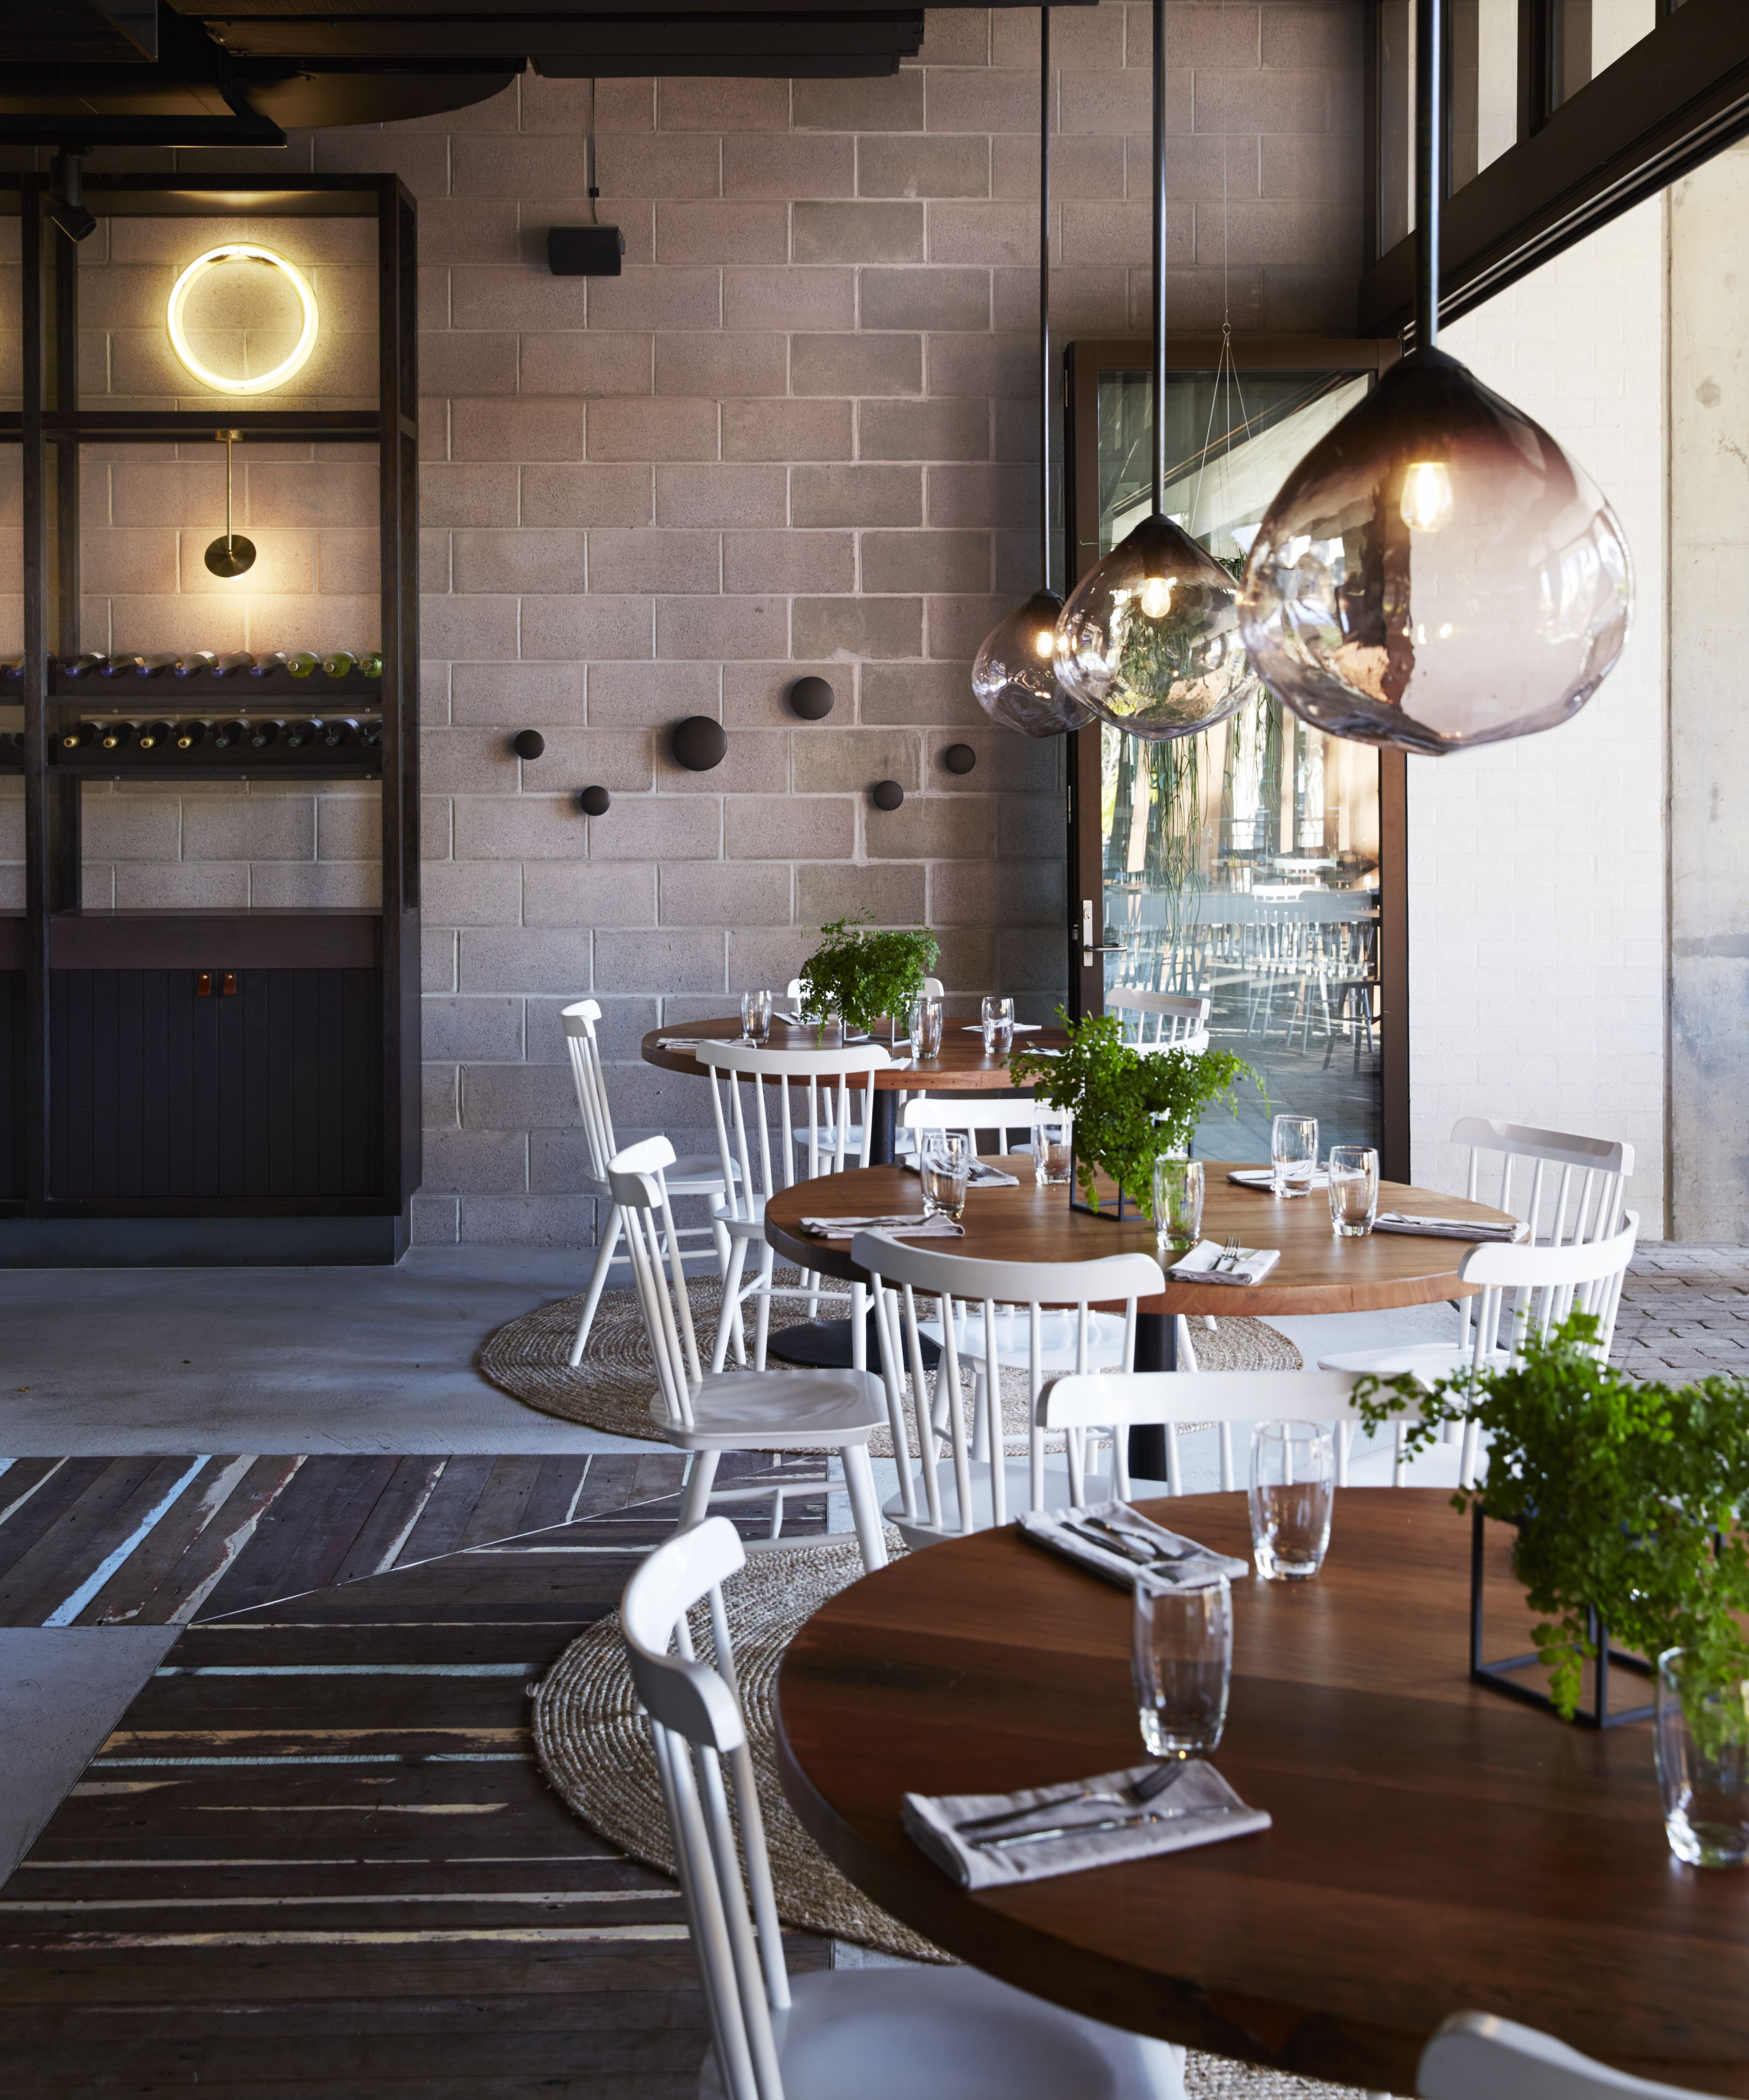 Chair Ironica by TON, Beccafico Bar & Trattoria; Sydney, Australia ...